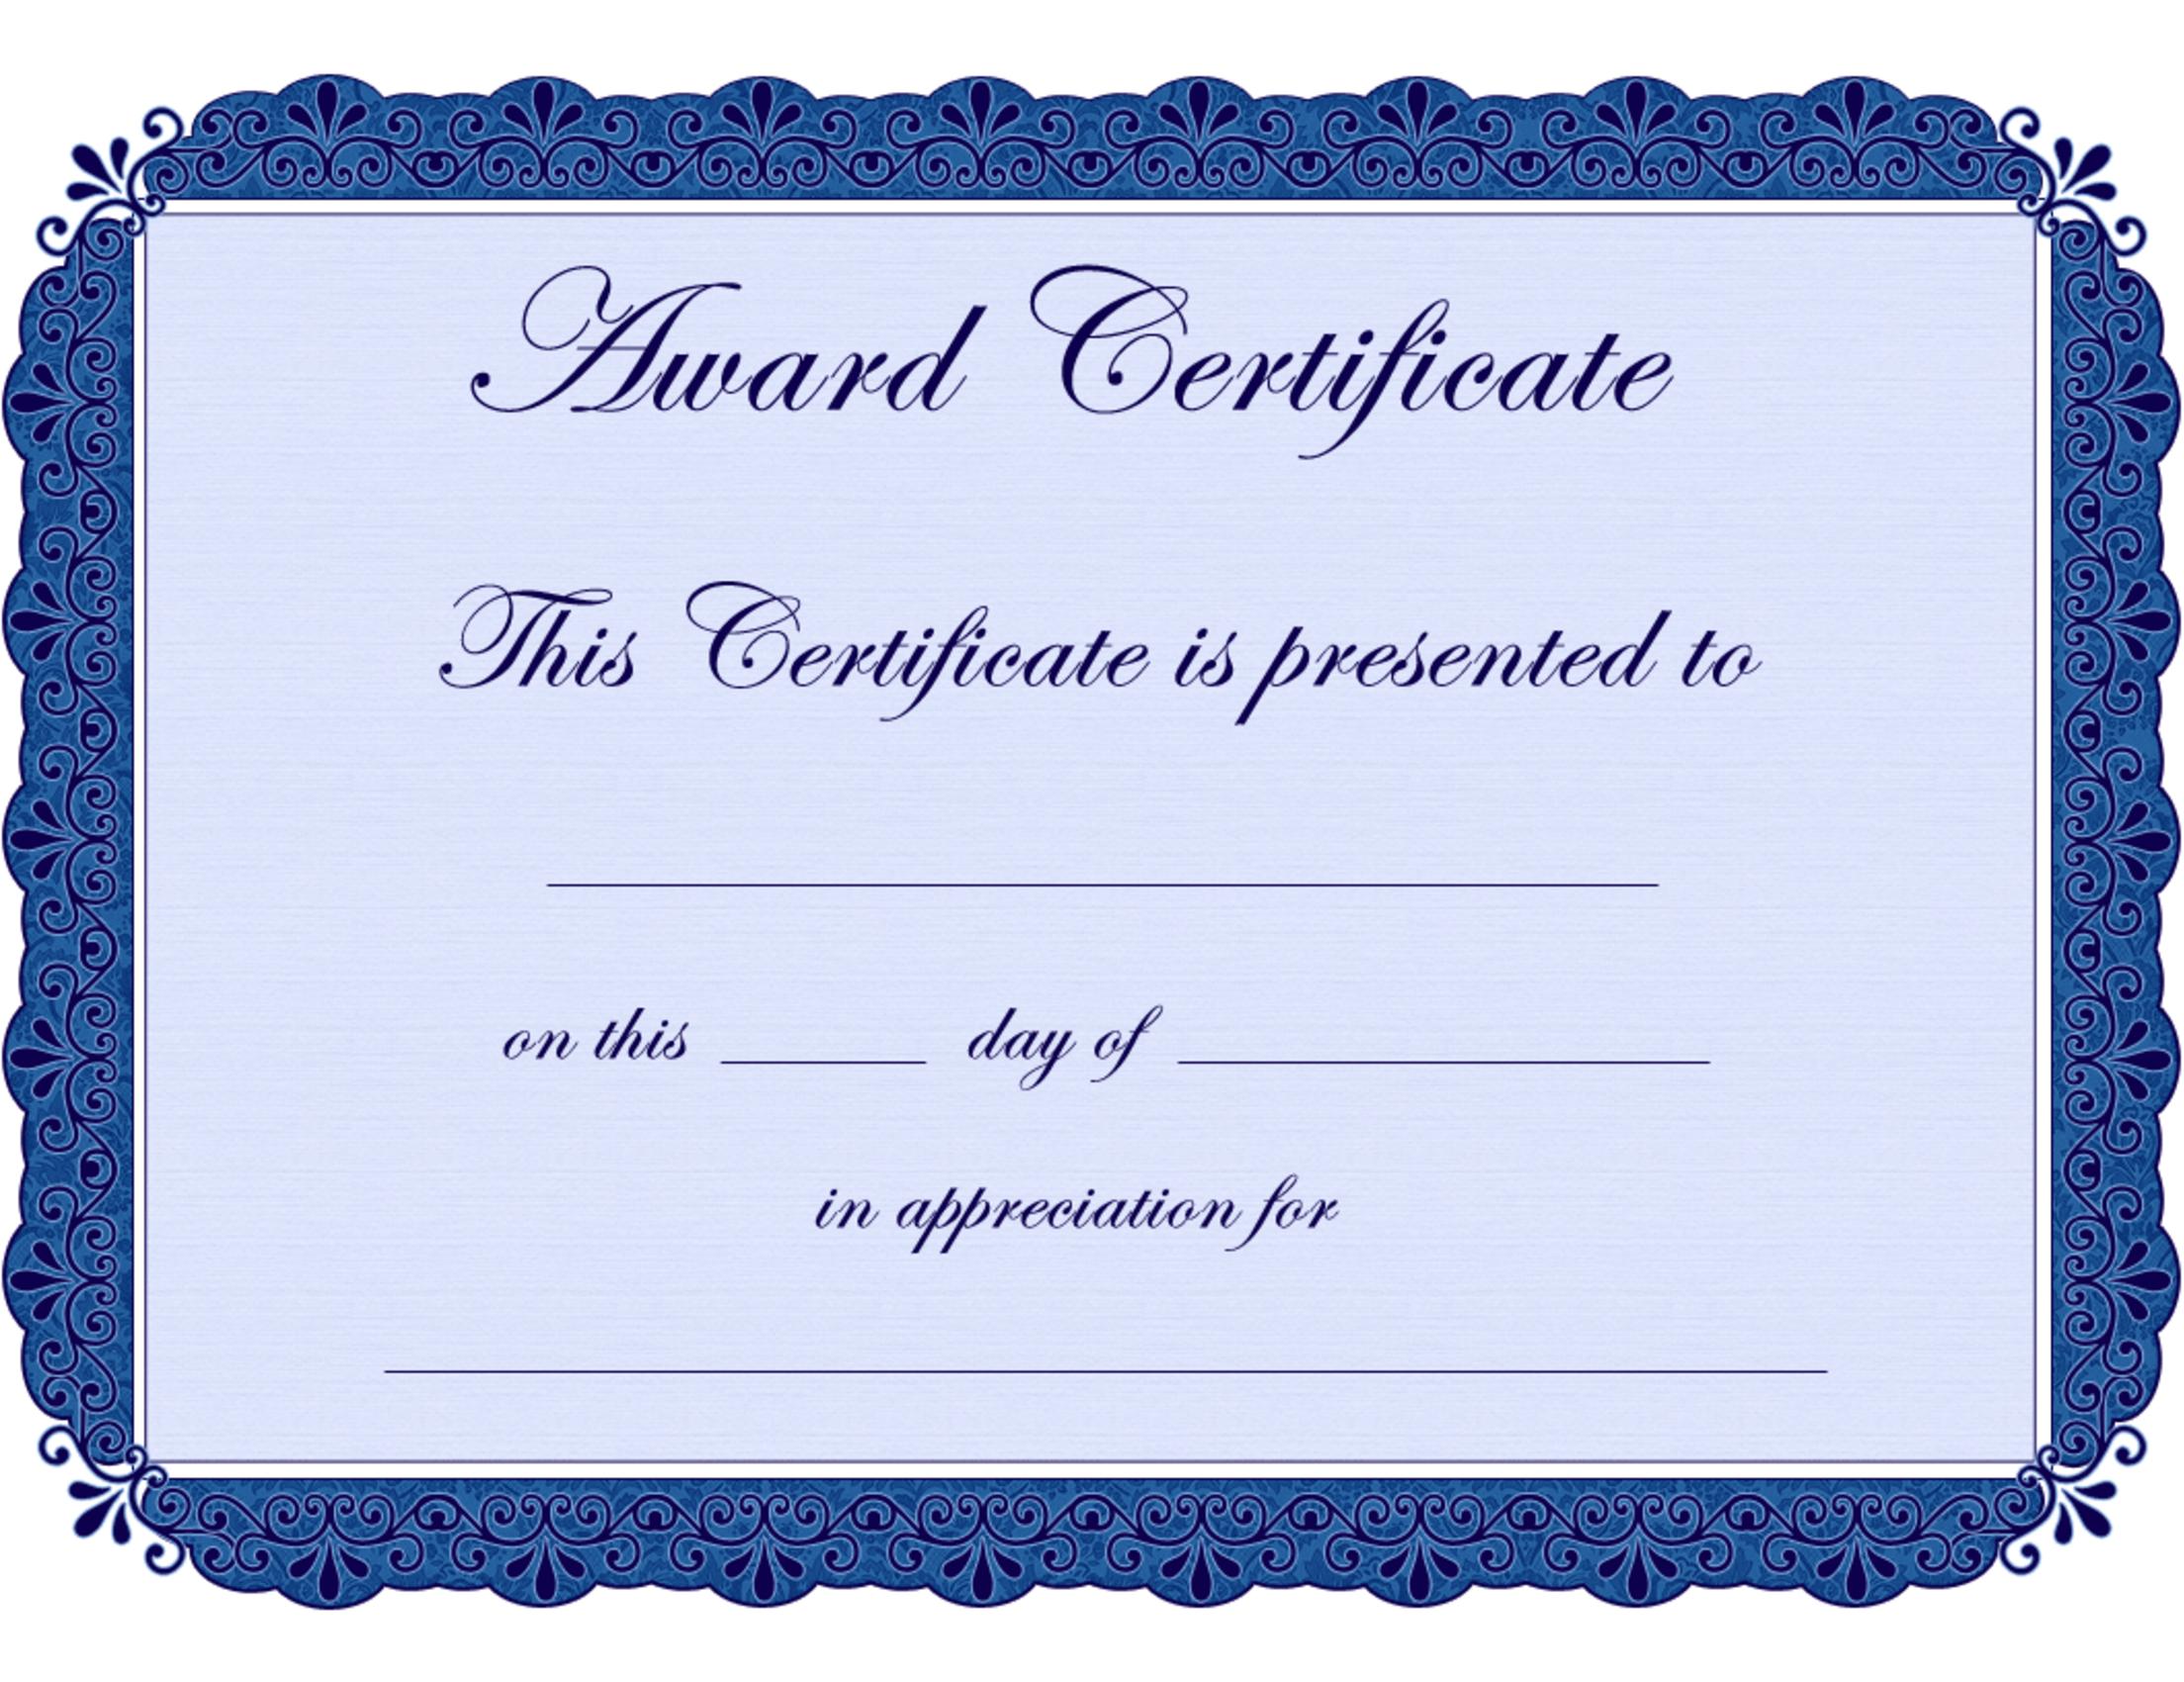 Free Printable Award Certificate Borders |  Award Certificate - Grandparents Certificate Free Printable